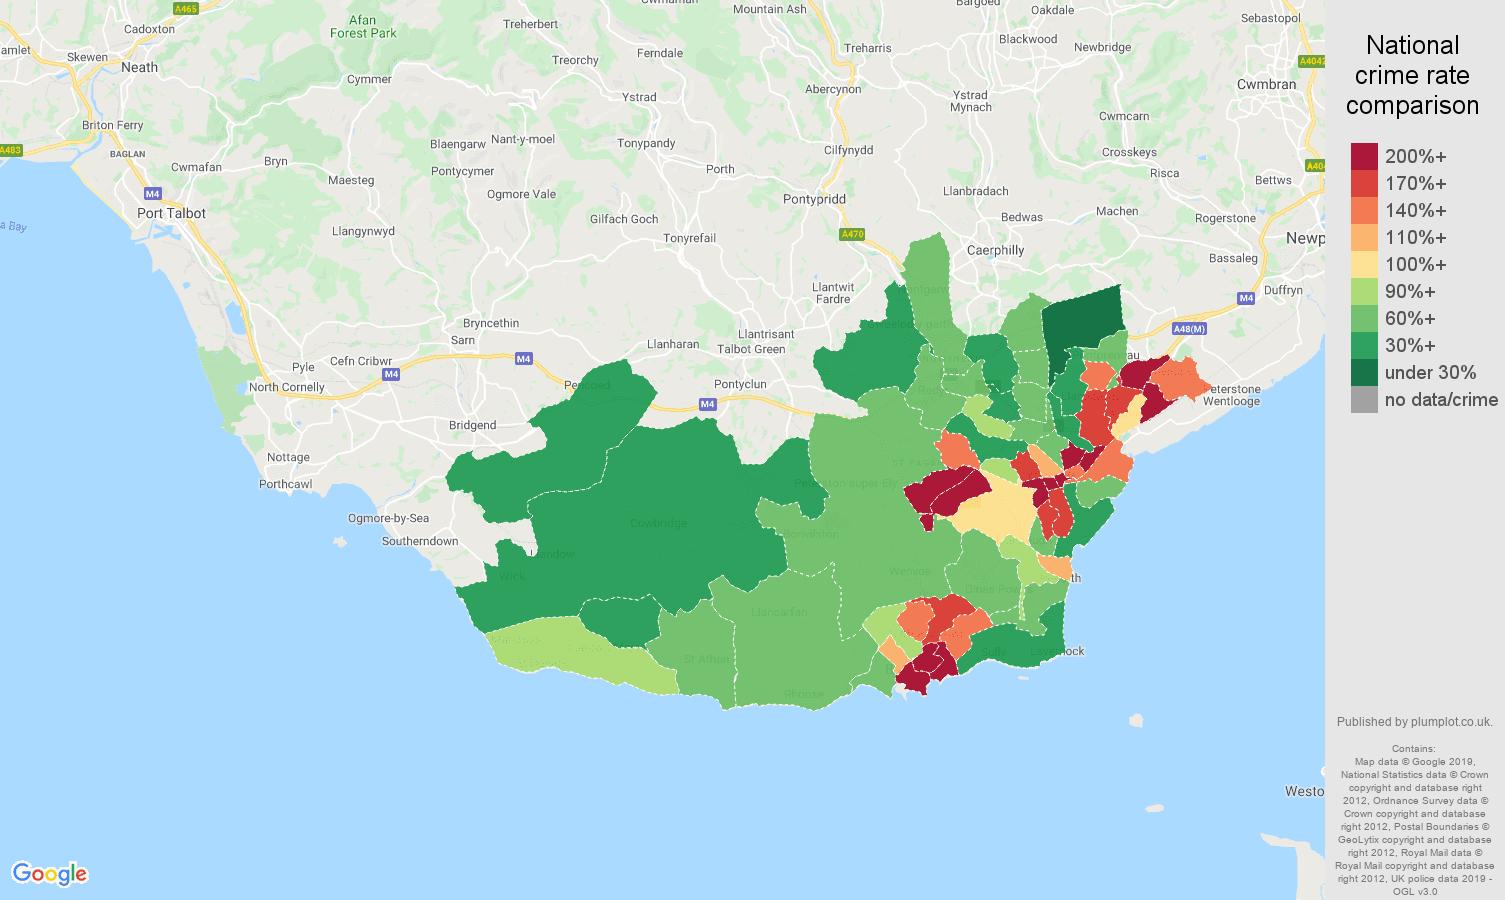 South Glamorgan public order crime rate comparison map